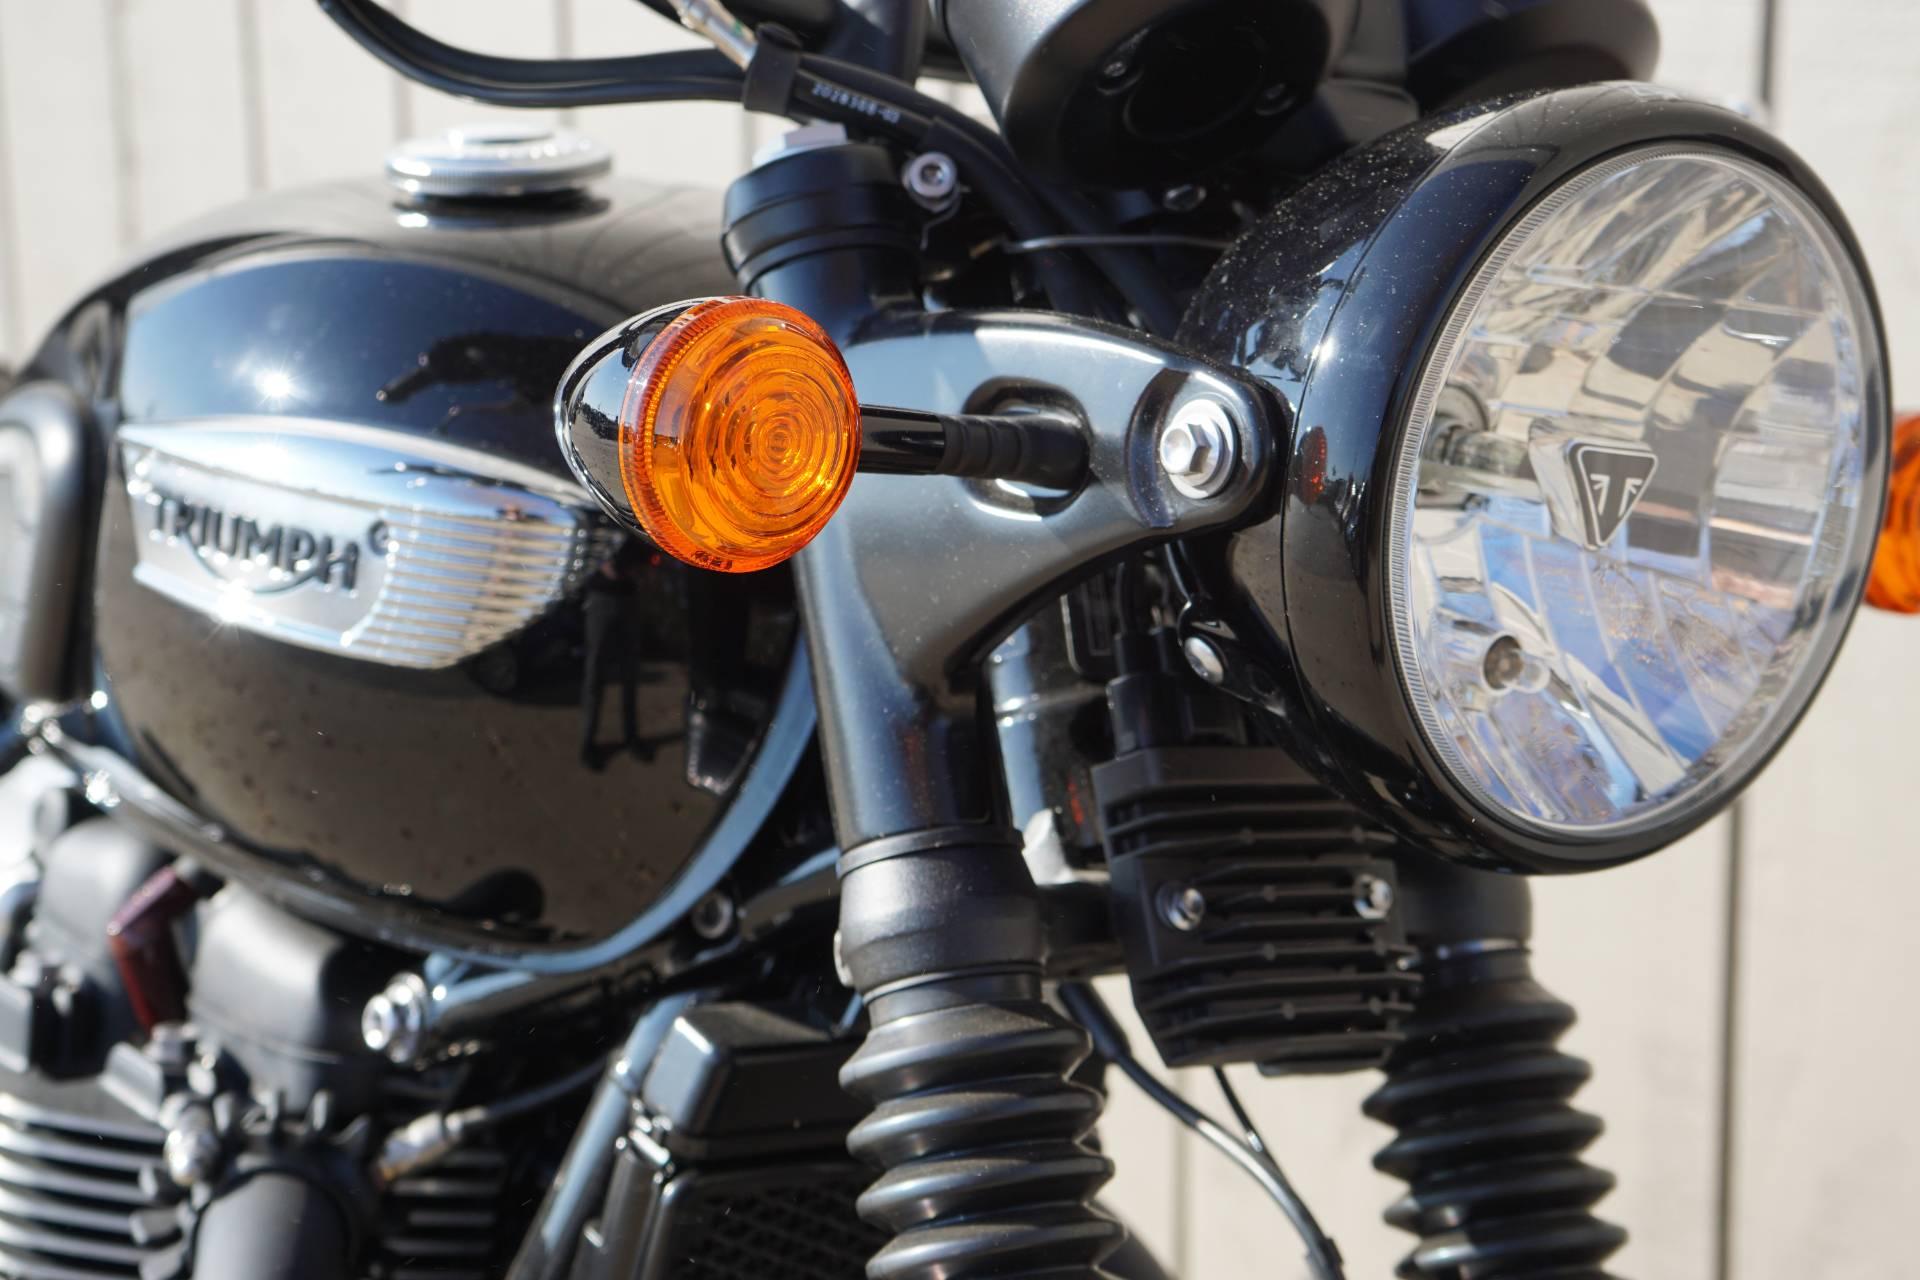 New 2018 Triumph Bonneville T100 Black Motorcycles In Elk Grove Ca